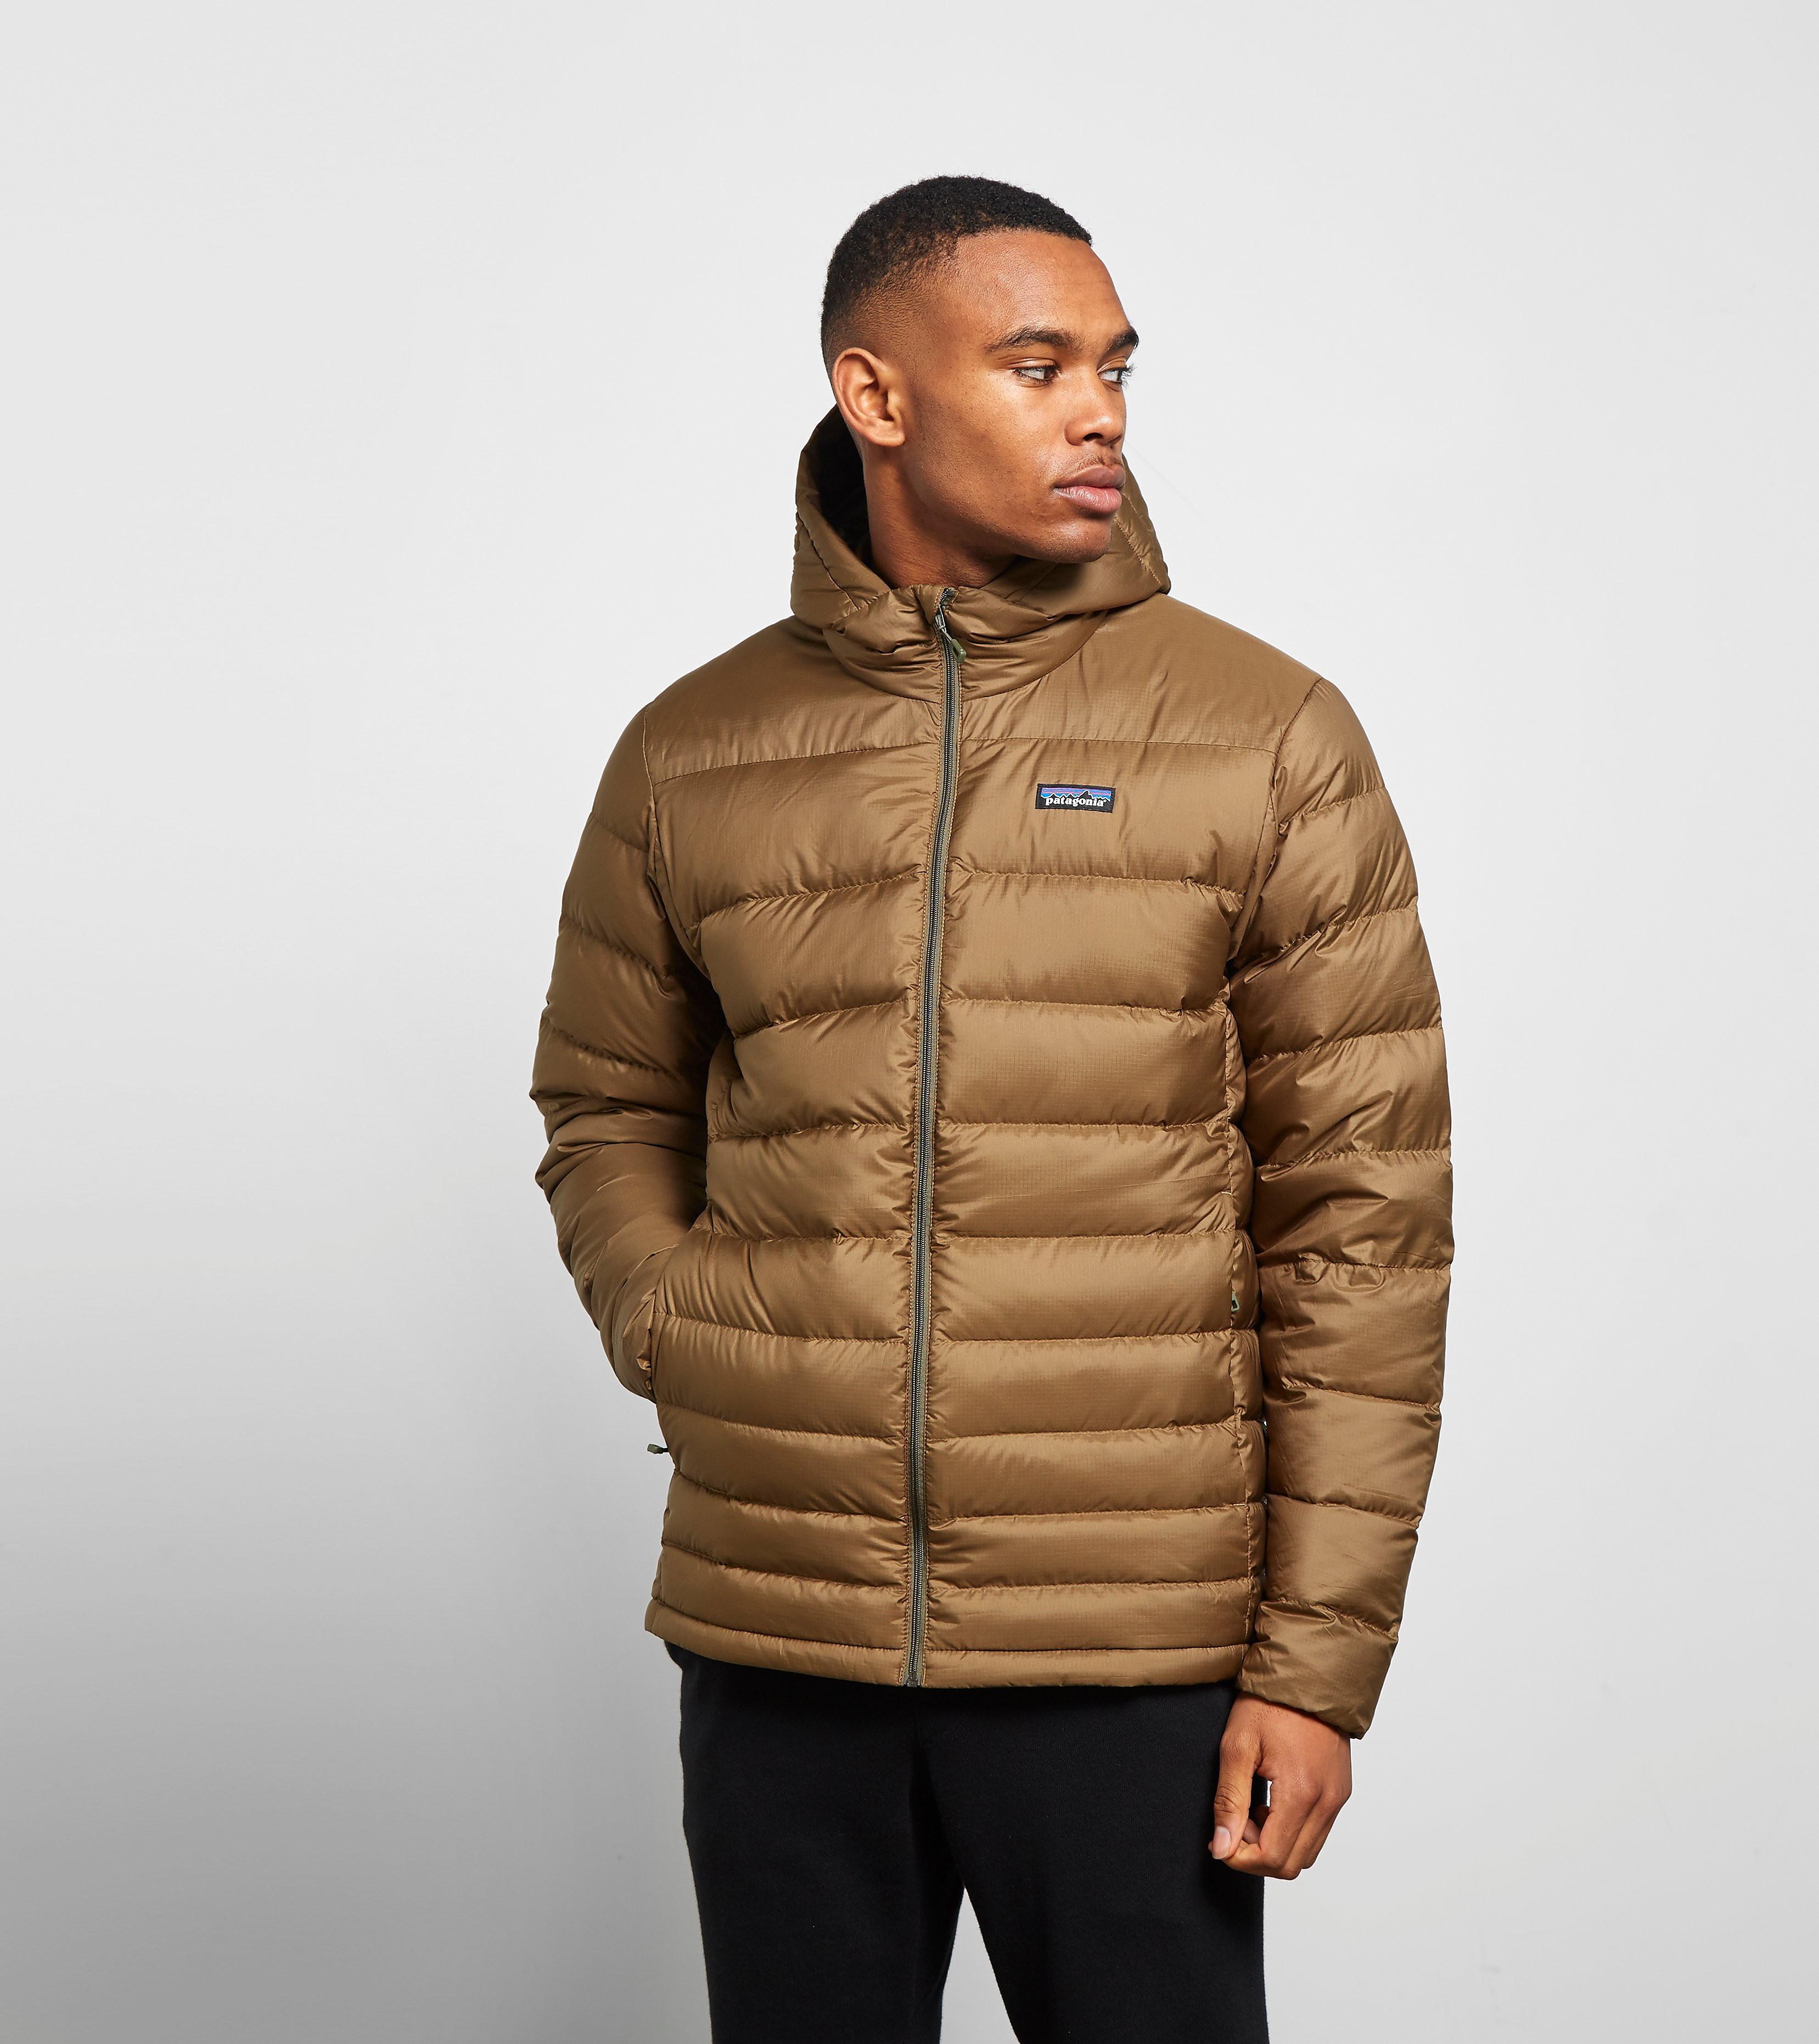 Patagonia Hi-Loft Down Jacket